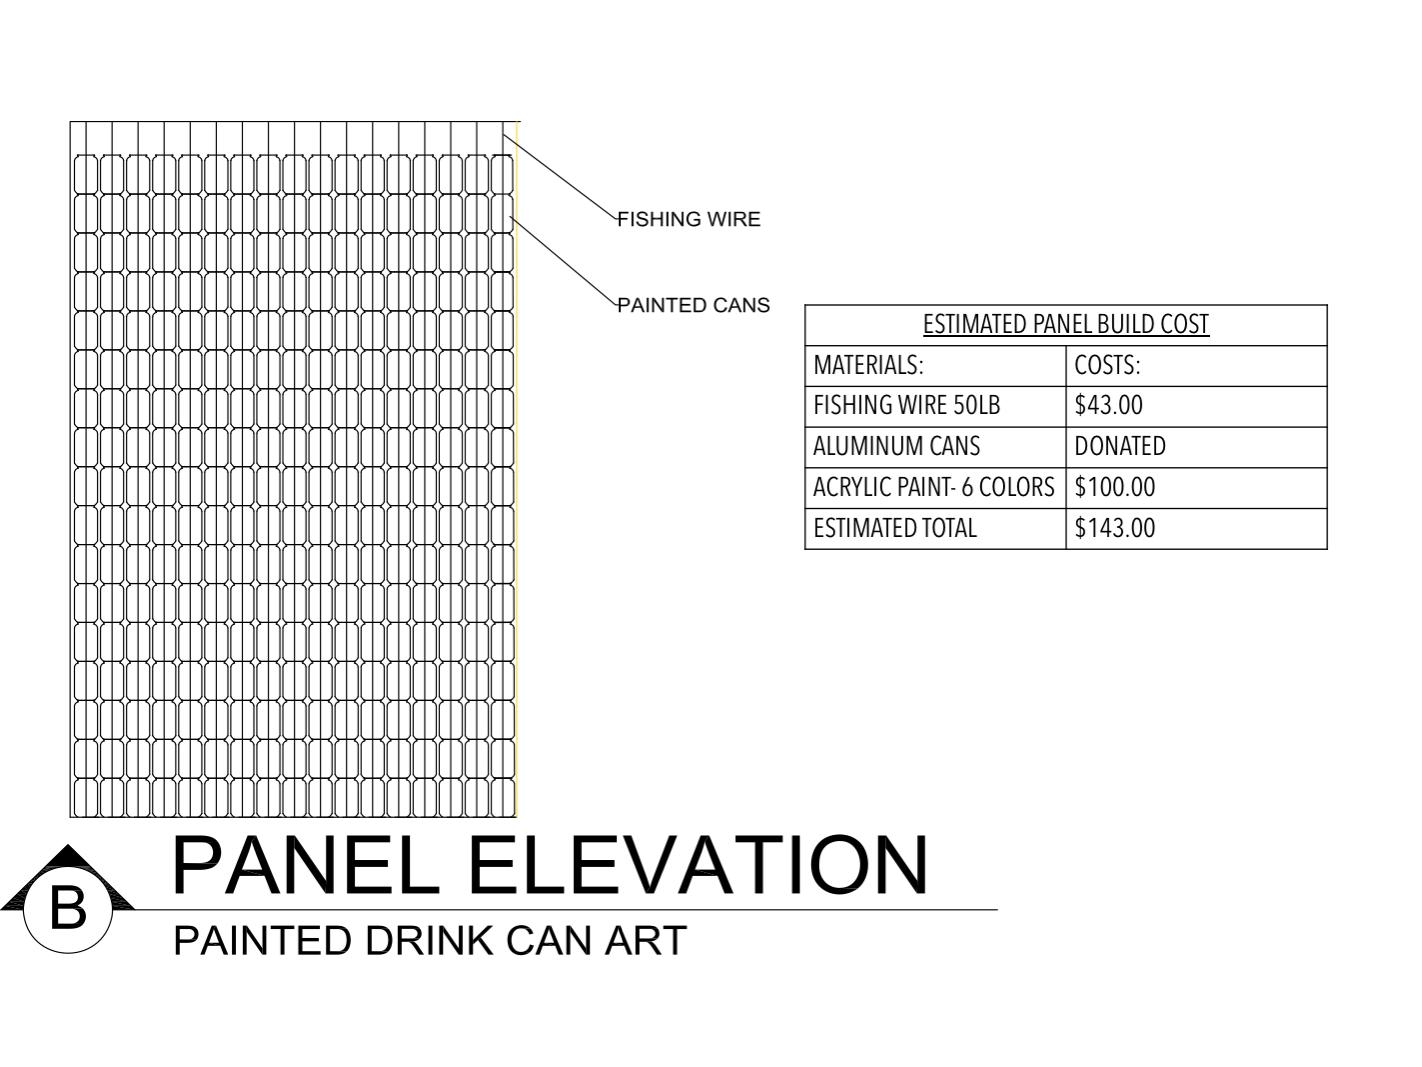 Panel Elevation B